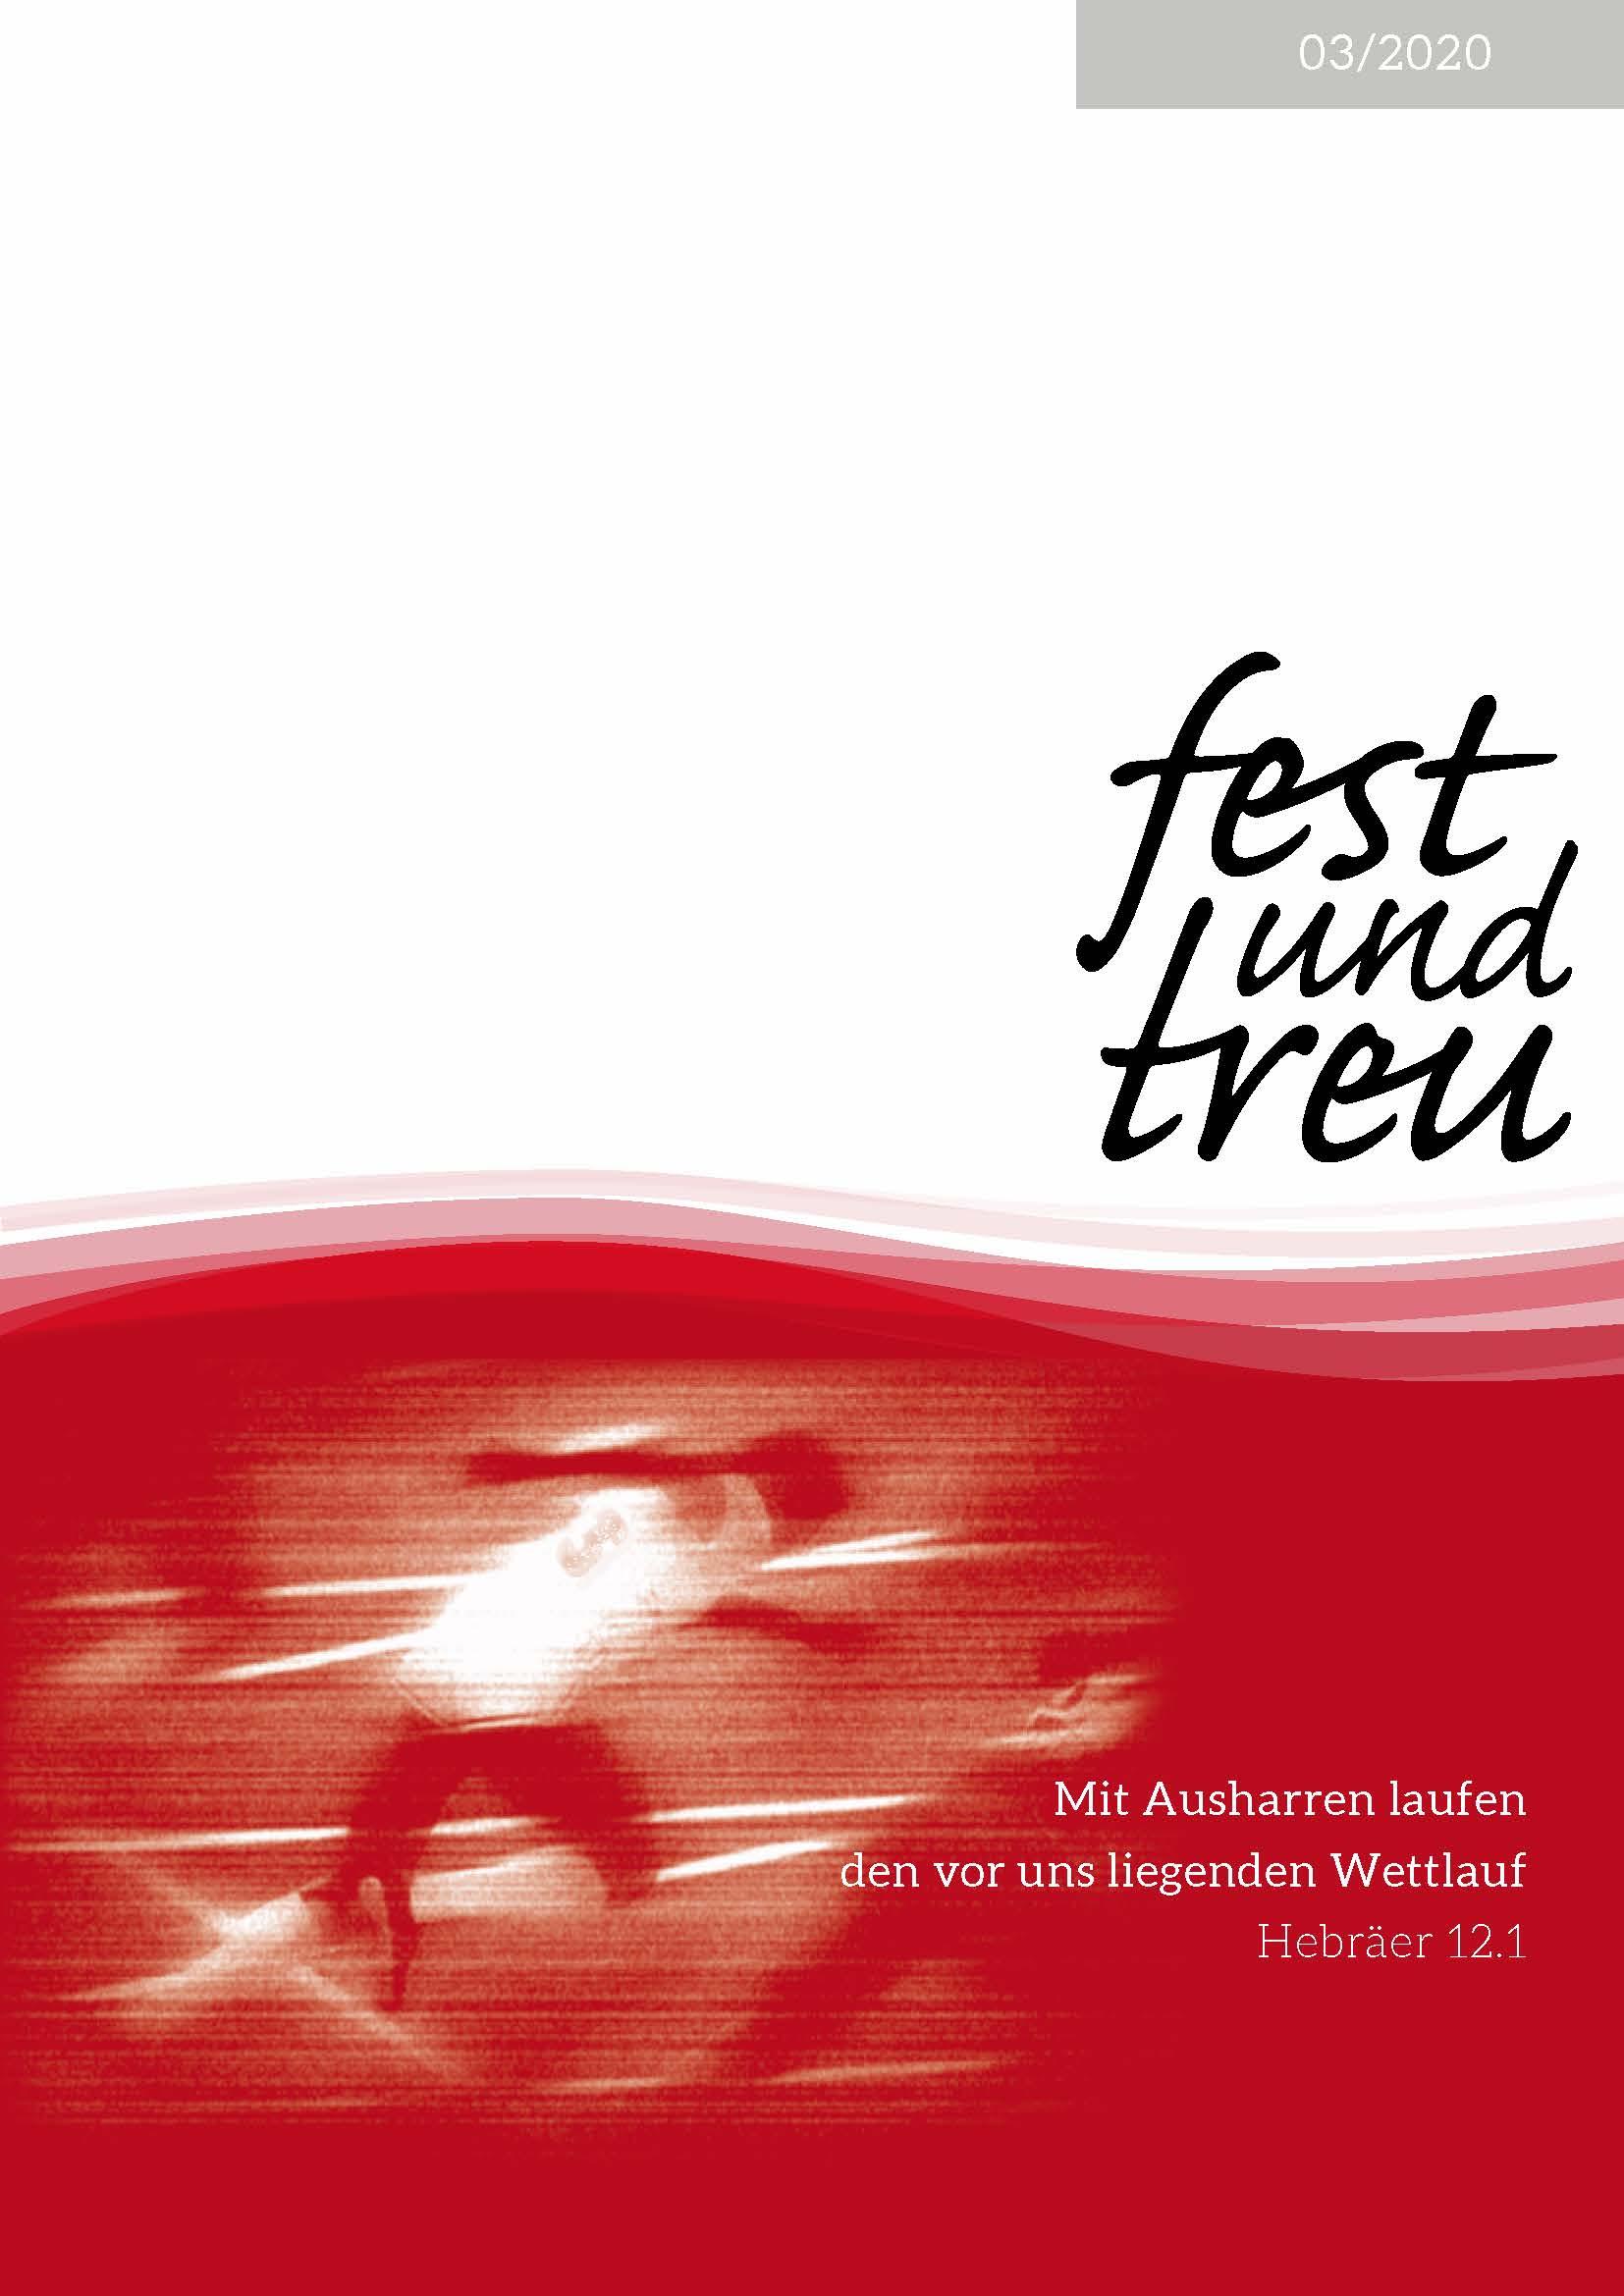 fest & treu - 3/2020